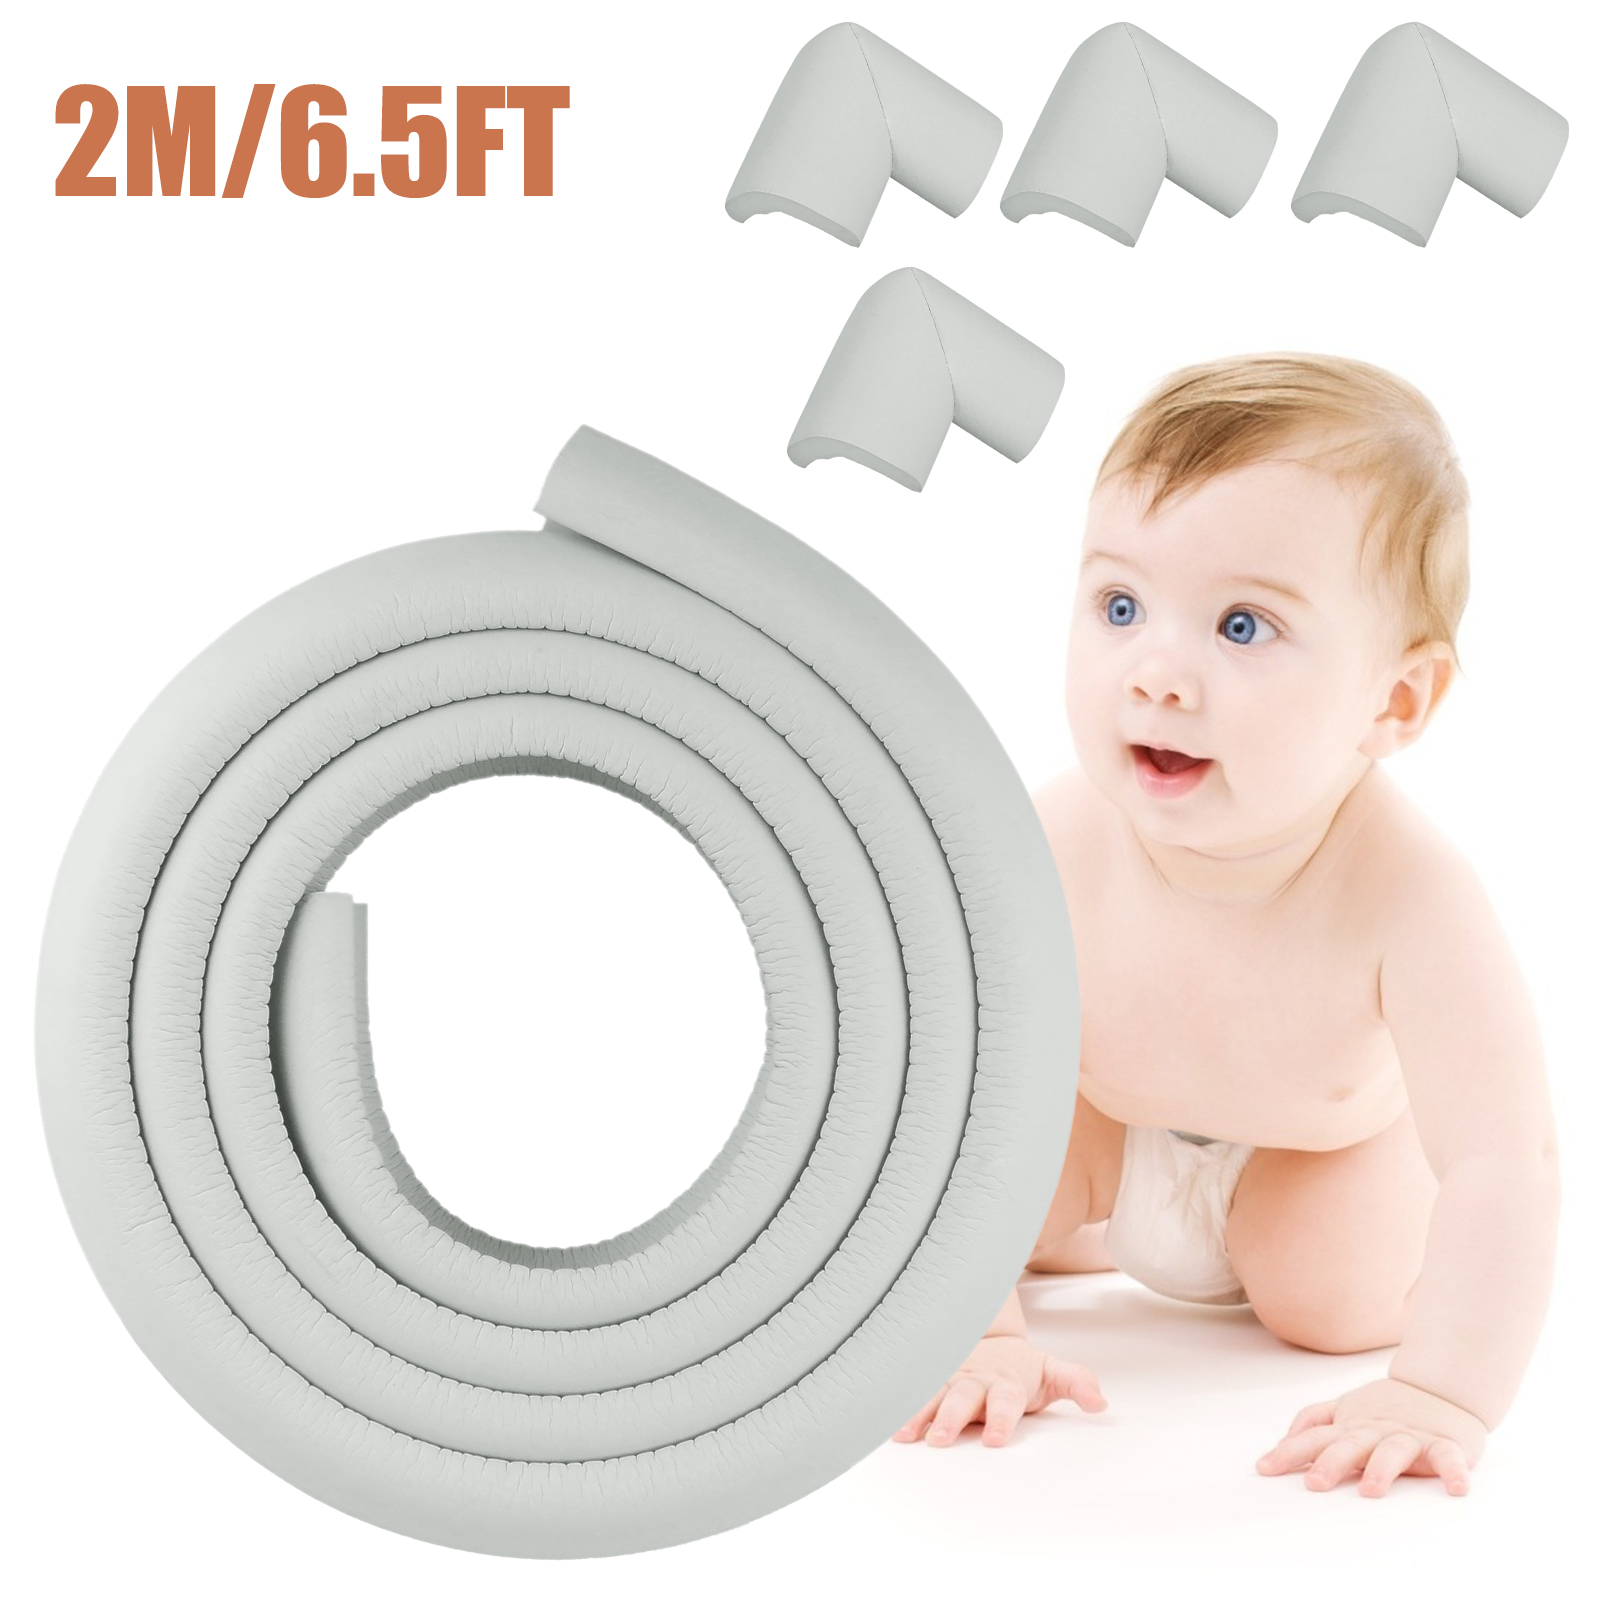 10Pc Kids Baby Table Desk Safe Edge Corner Cushion Guard Strip Bumper Protector